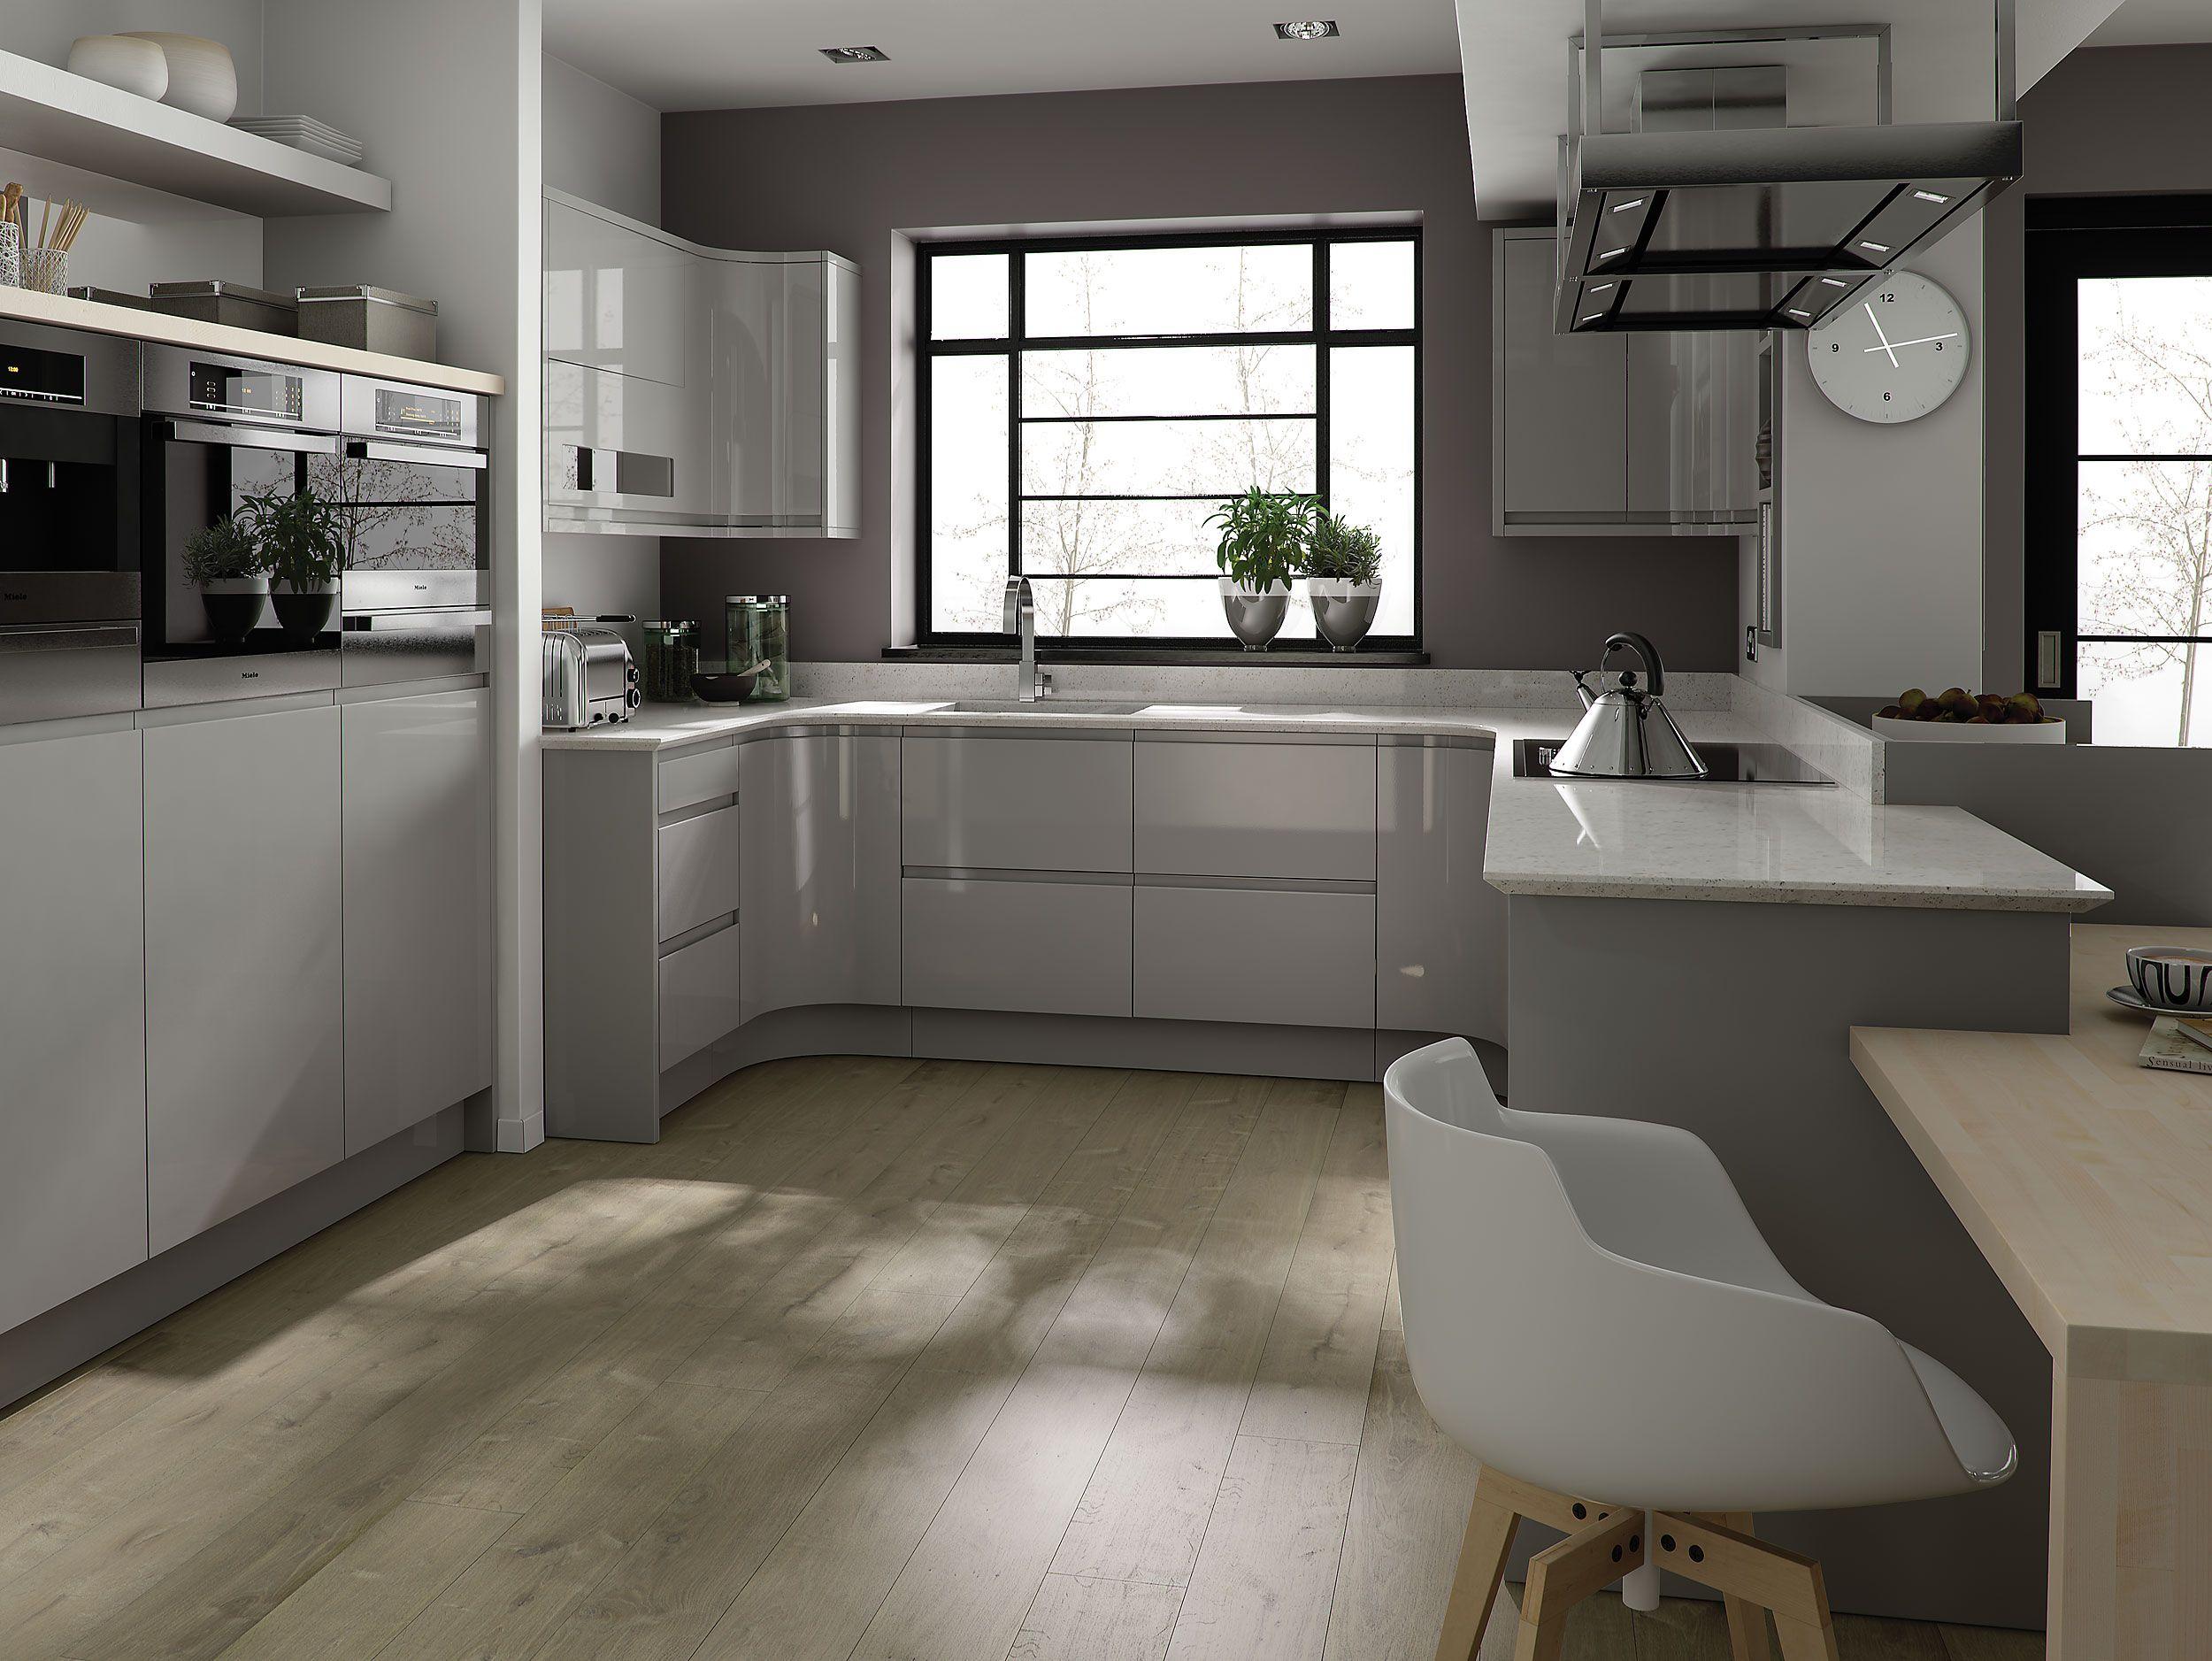 Light Grey Painted Kitchen Cabinets & Light Grey Painted Kitchen Cabinets | Kitchens! | Pinterest | Dove ... kurilladesign.com